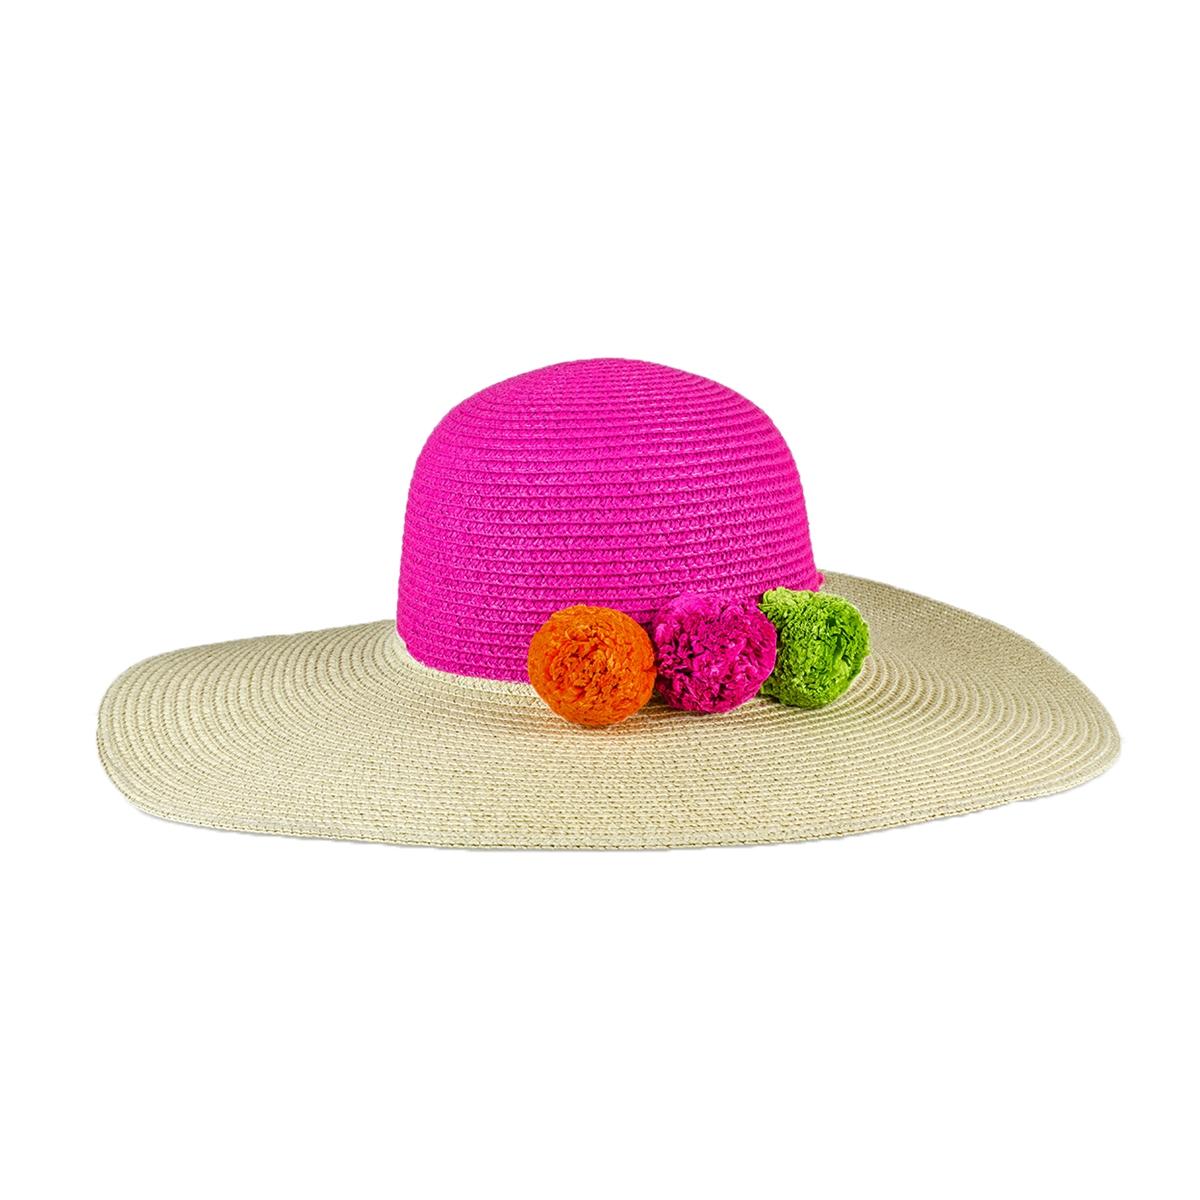 b7eafc435 Magid Cocktail Time Floppy Straw Sun Hat, Multi